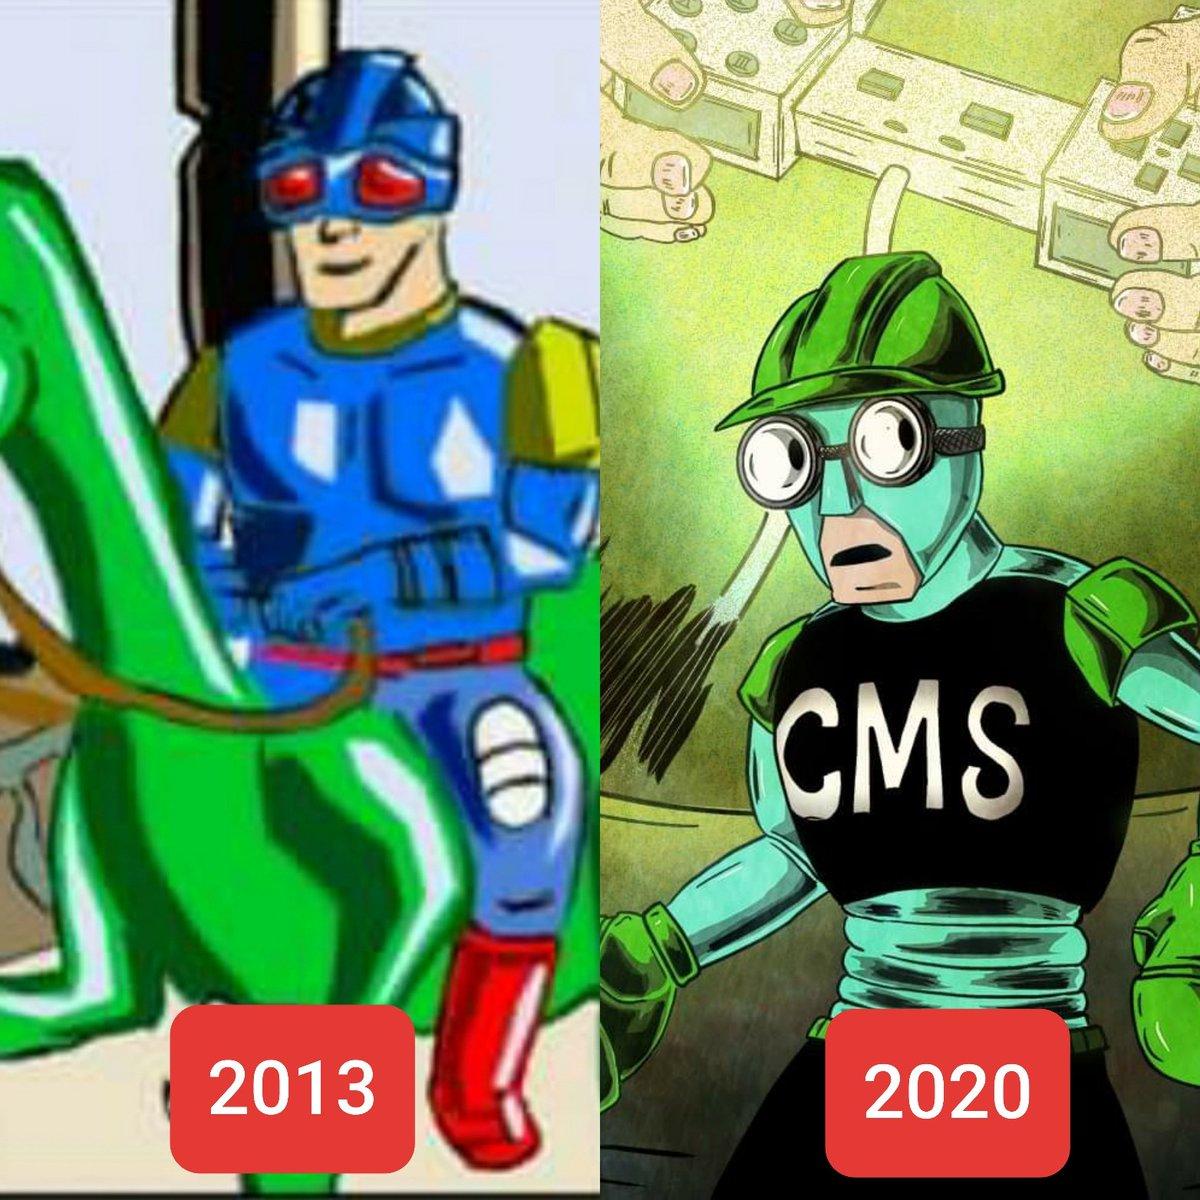 On this #fbf, here is Corp. Mass Scott throughout the years.  #flashbackfriday #creatorownedcomic #backintheday #college #nhia #iadnec #makecomics #artisticgrowth #illustrator #dinosaur #videogames #robot #corpmassscott #cms #artschooldays #nabthenineties #chollandart